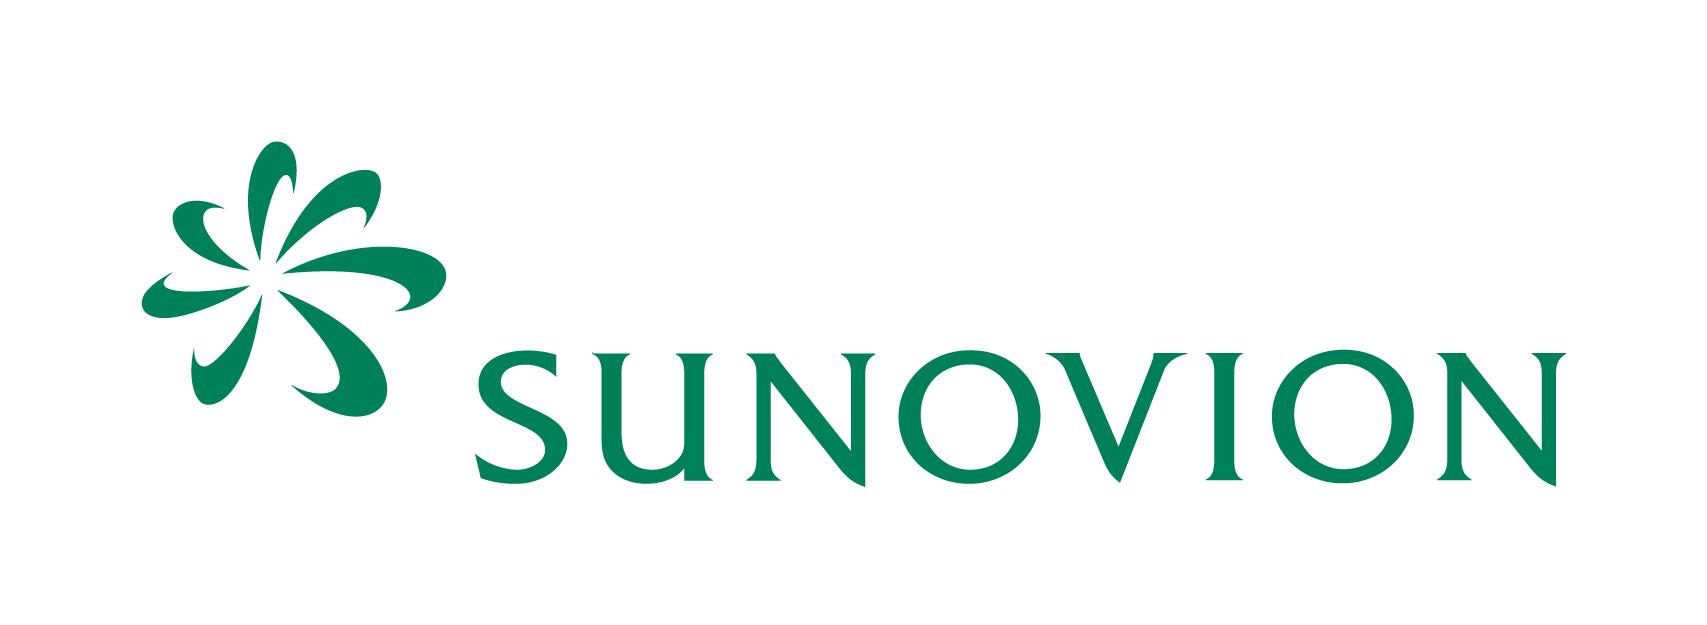 Sunovion Pharmaceuticals To Acquire Cynapsus Therapeutics Business Sumitomo Wiring System Wire